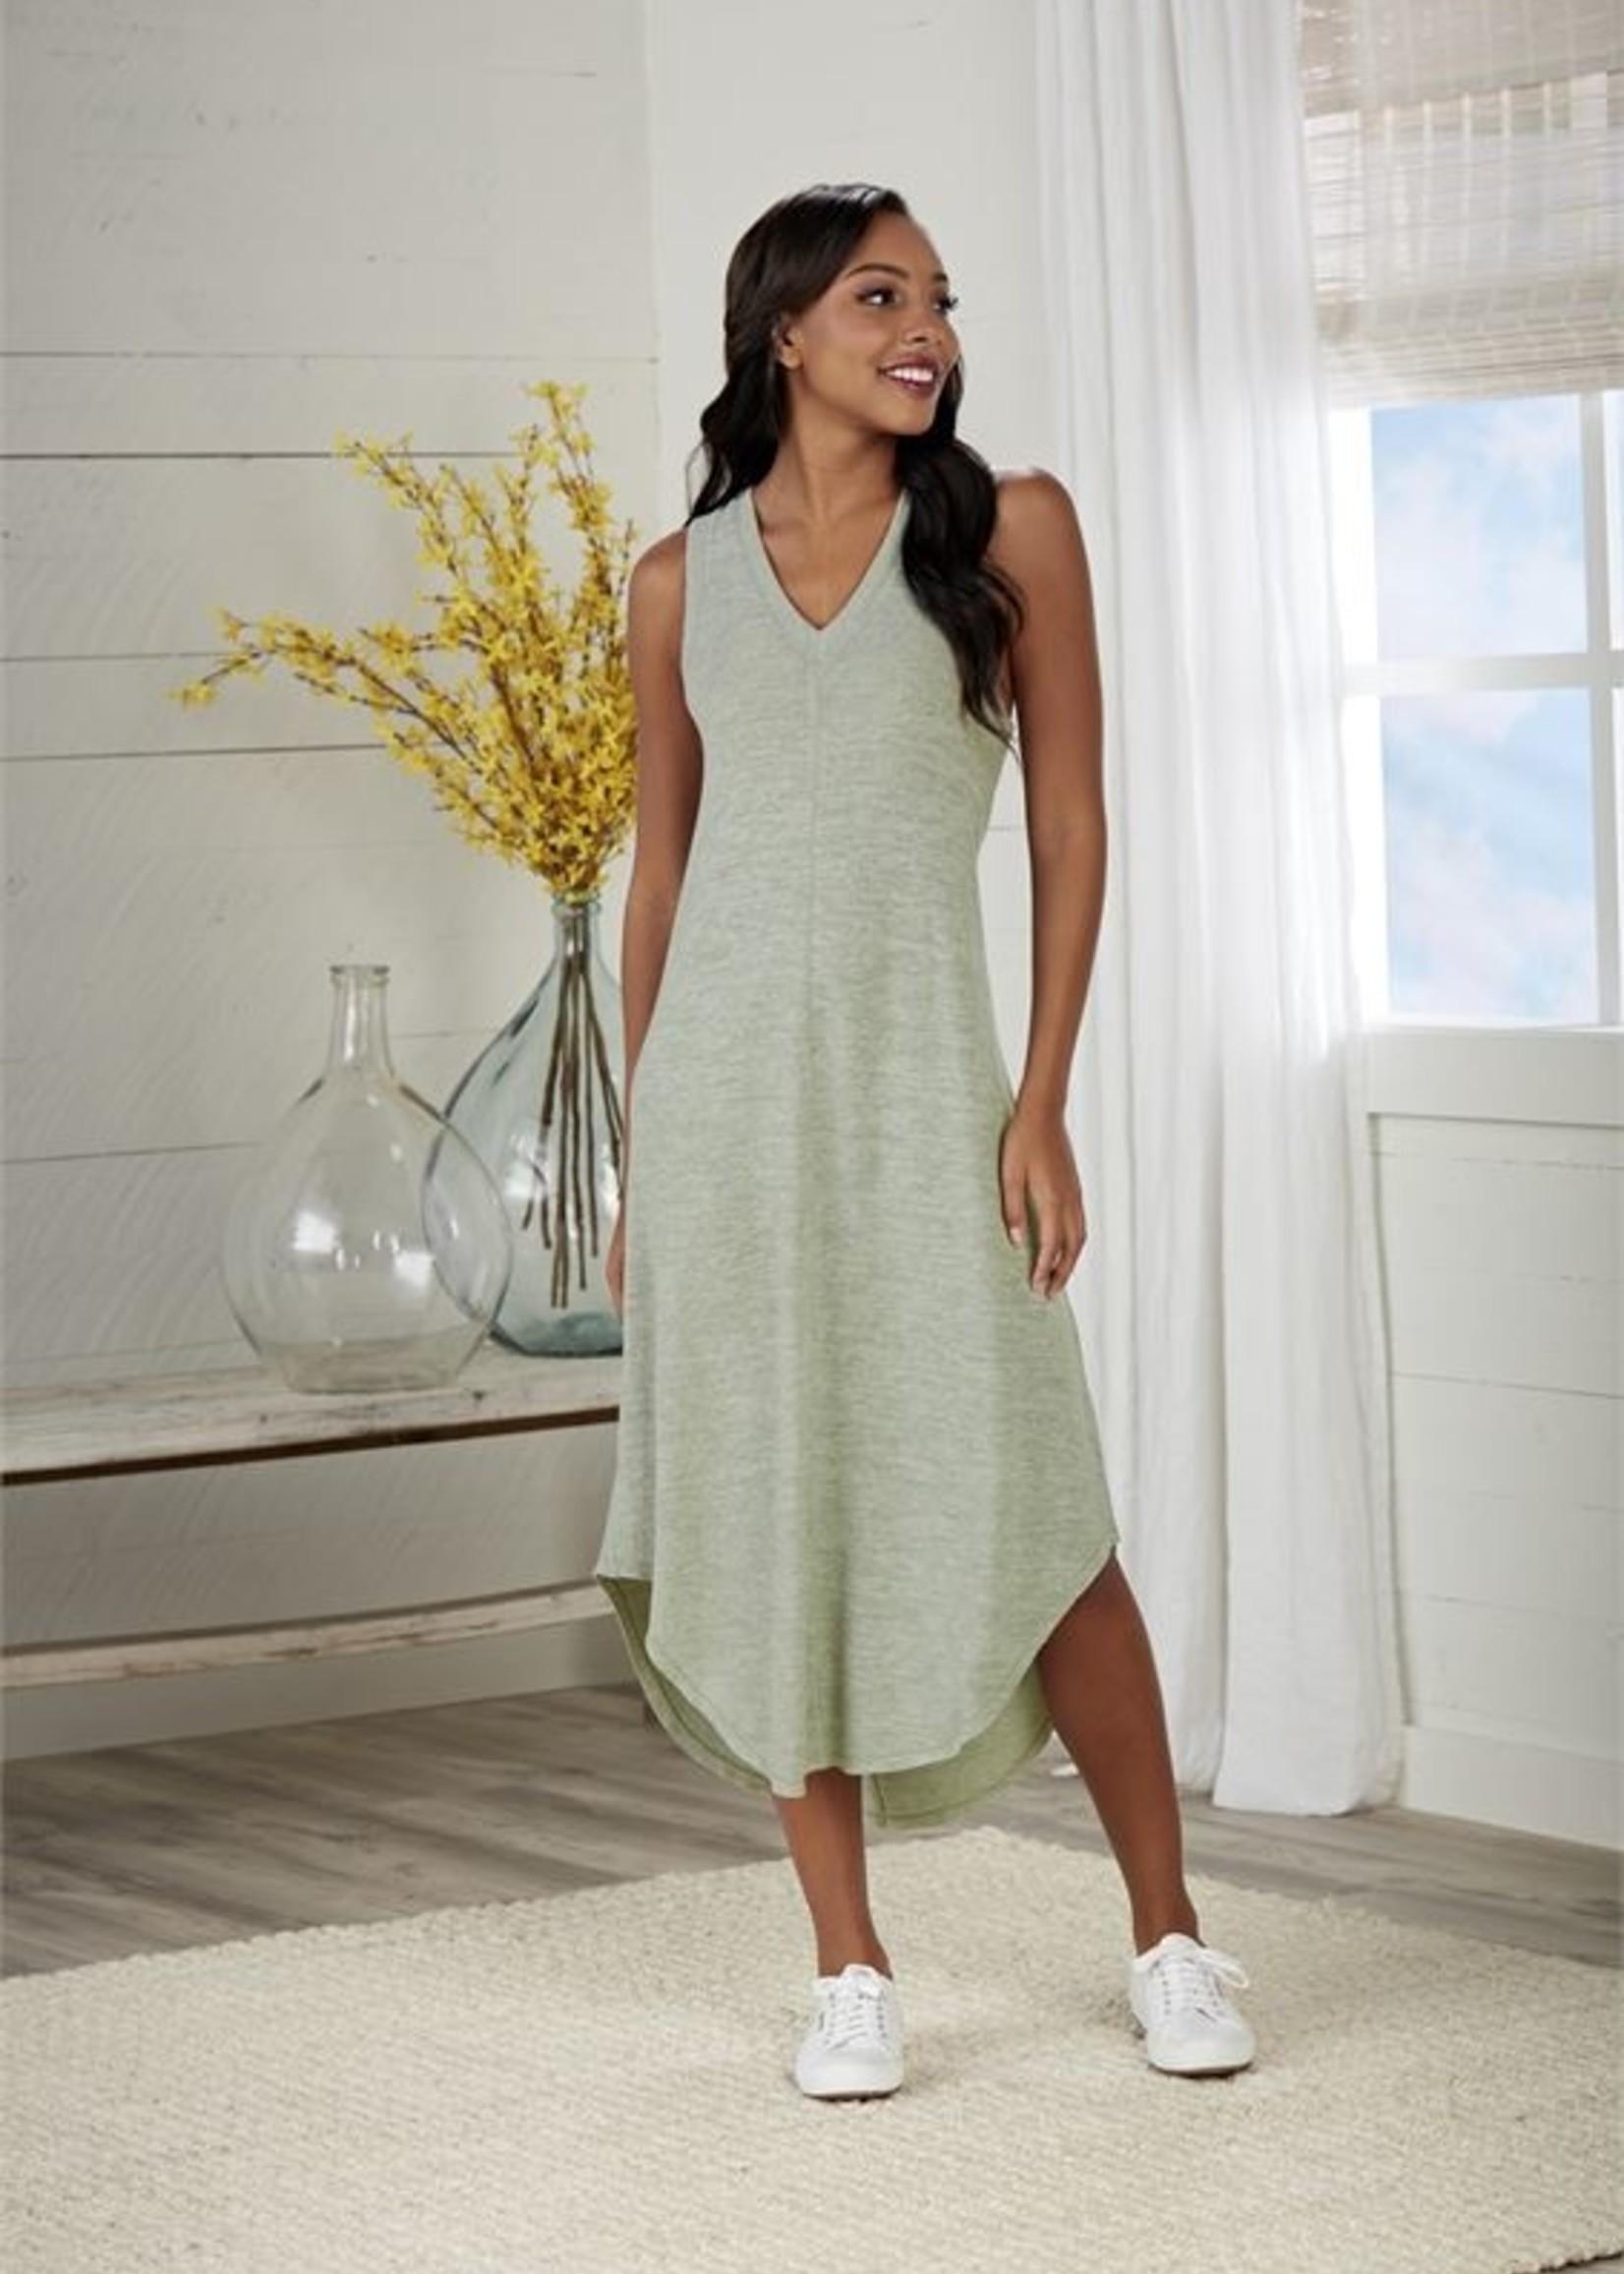 Elitaire Boutique Nash Midi Dress in Sage